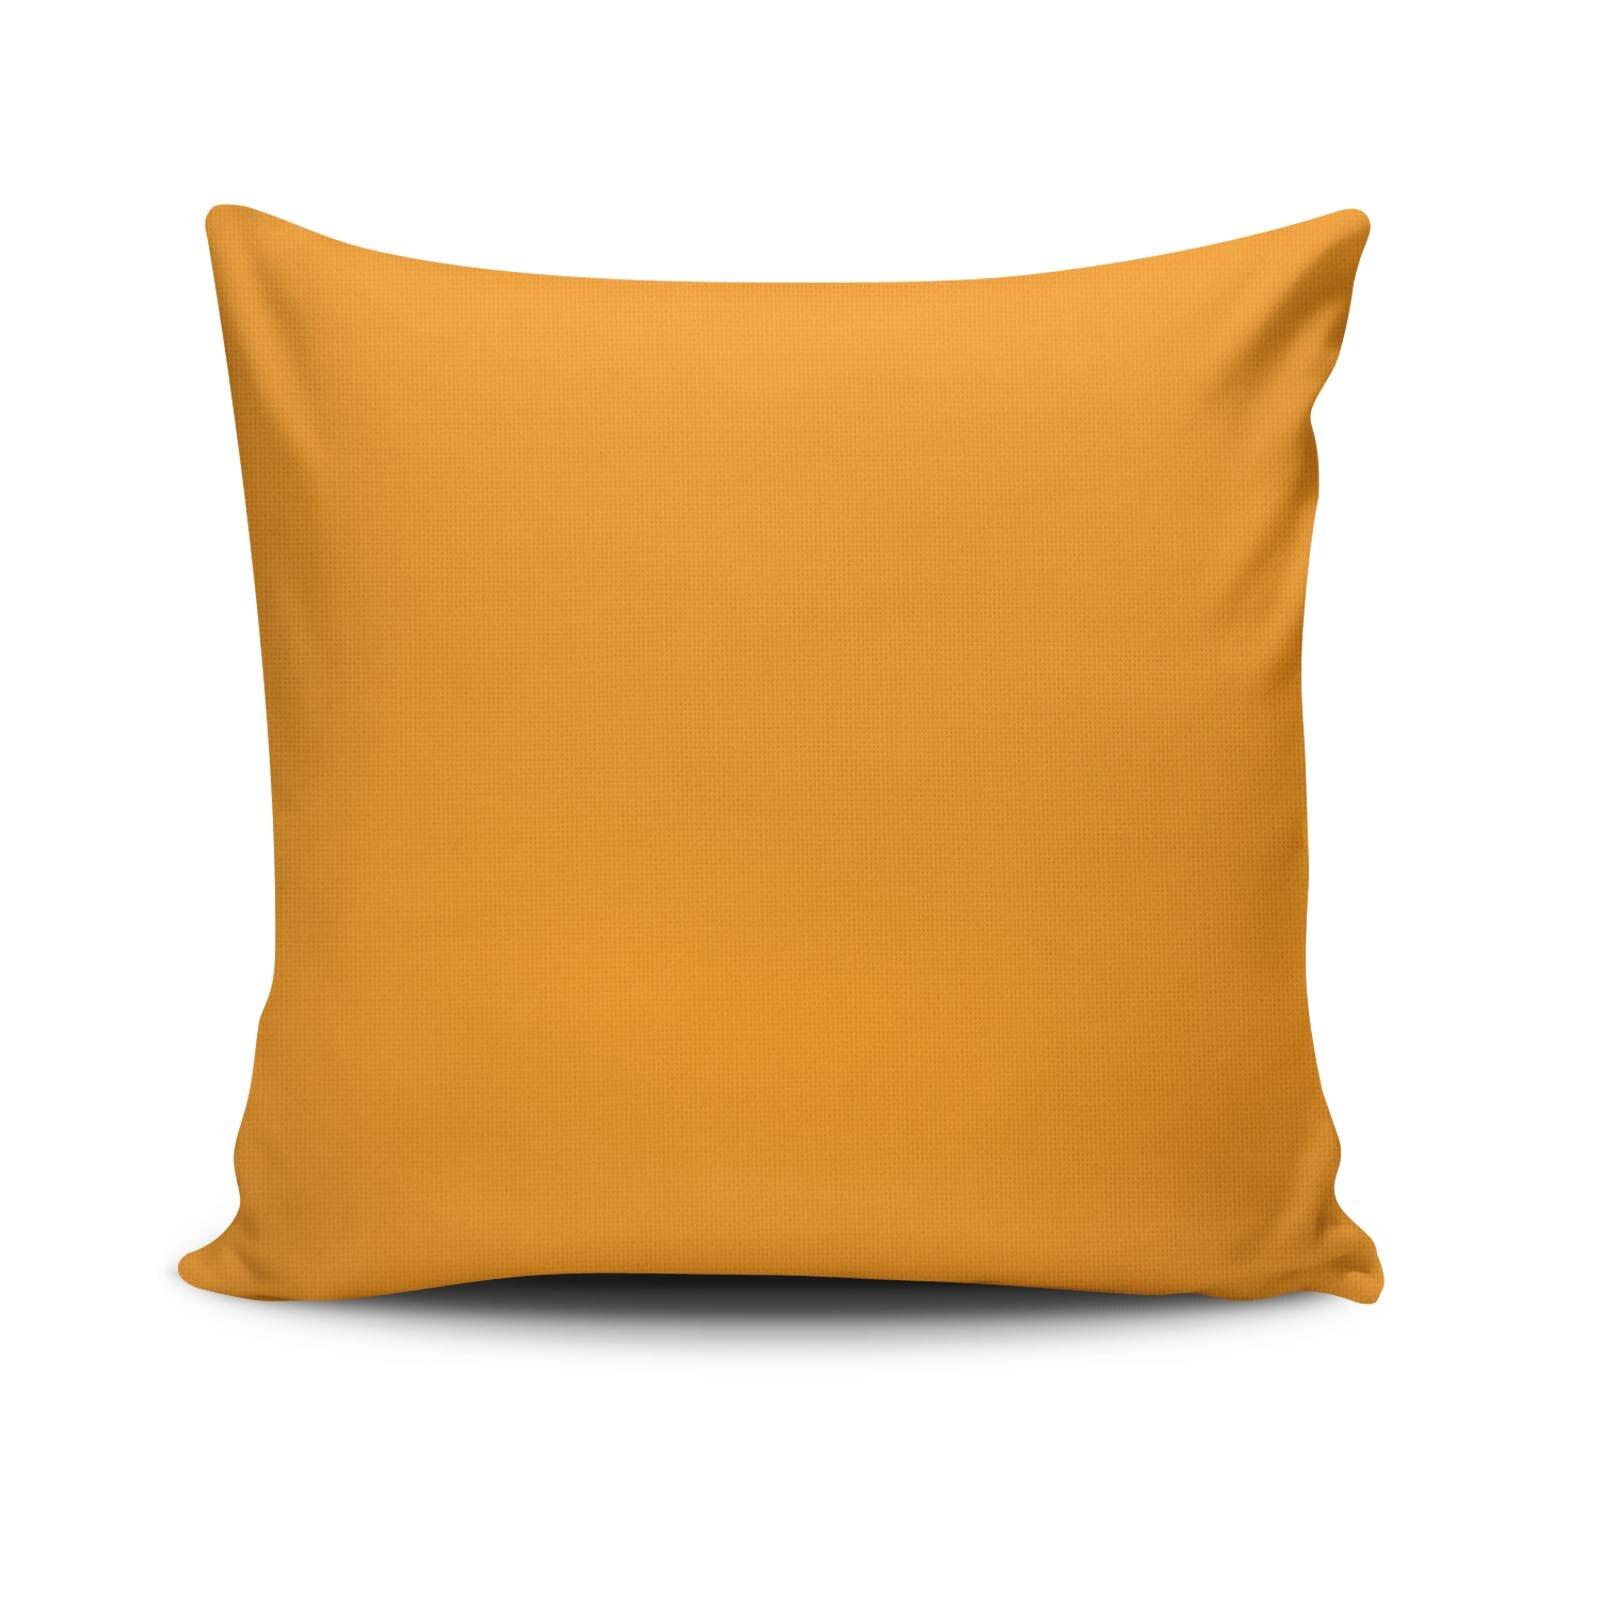 Perna decorativa Spiffy, Dimensiune: 45 x 45 cm, Material exterior: 50% bumbac / 50% poliester 425SPF0196